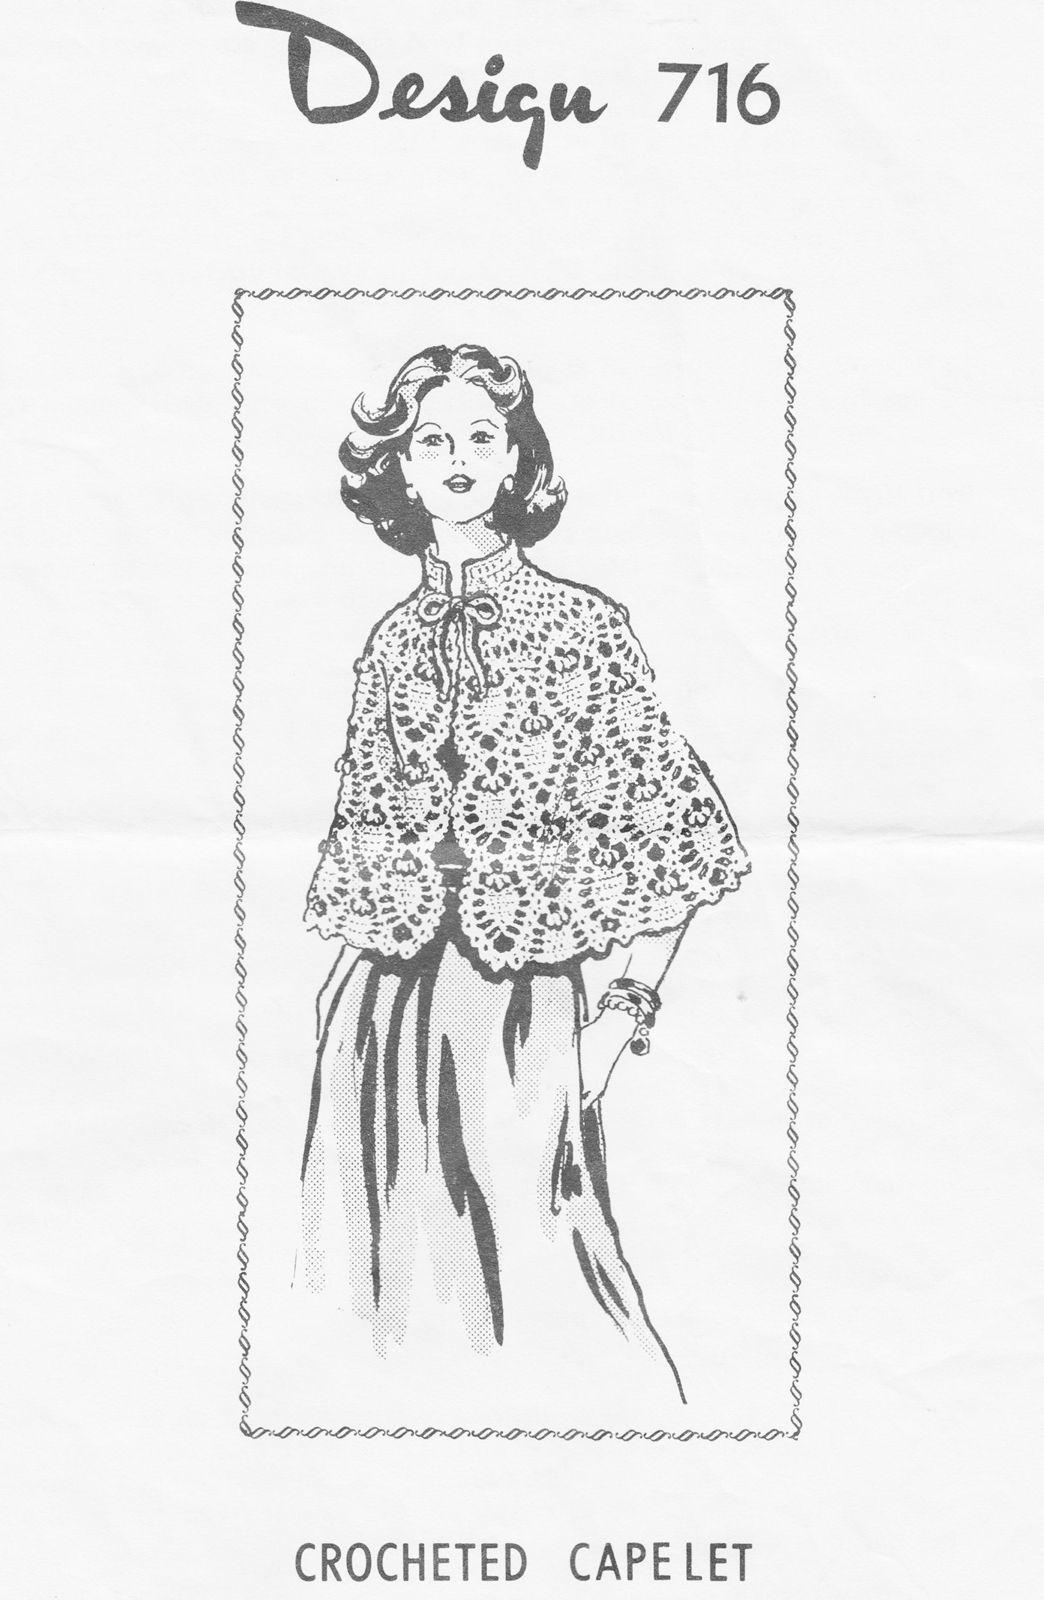 Design 716 Crocheted Pineapple Cape Pattern | Crochet Coats & Capes ...